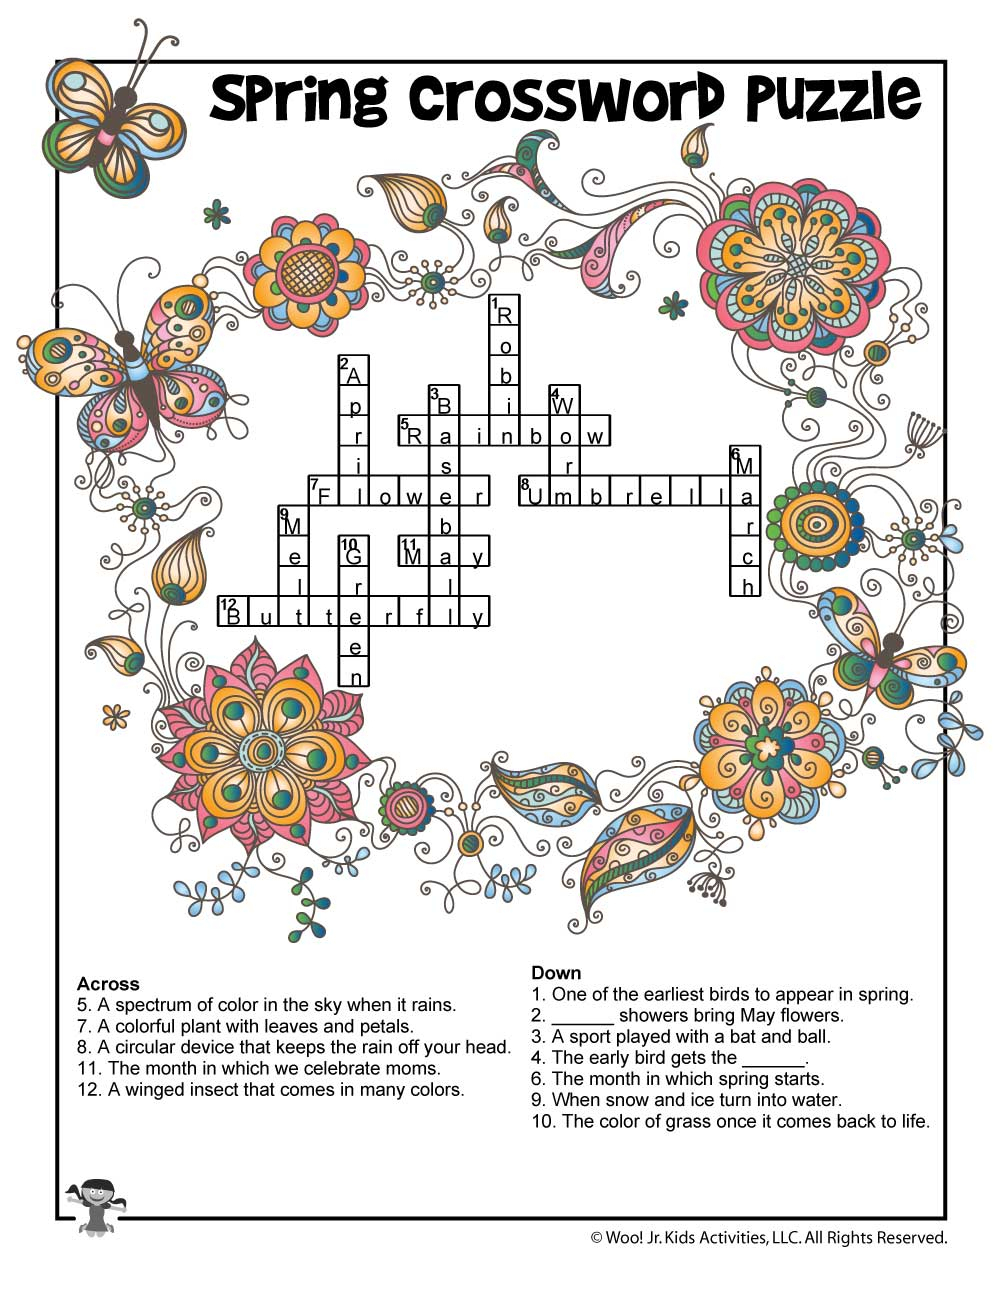 Spring Crossword Puzzle For Kids - Answer Key | Woo! Jr. Kids Activities - Printable Crossword Spring